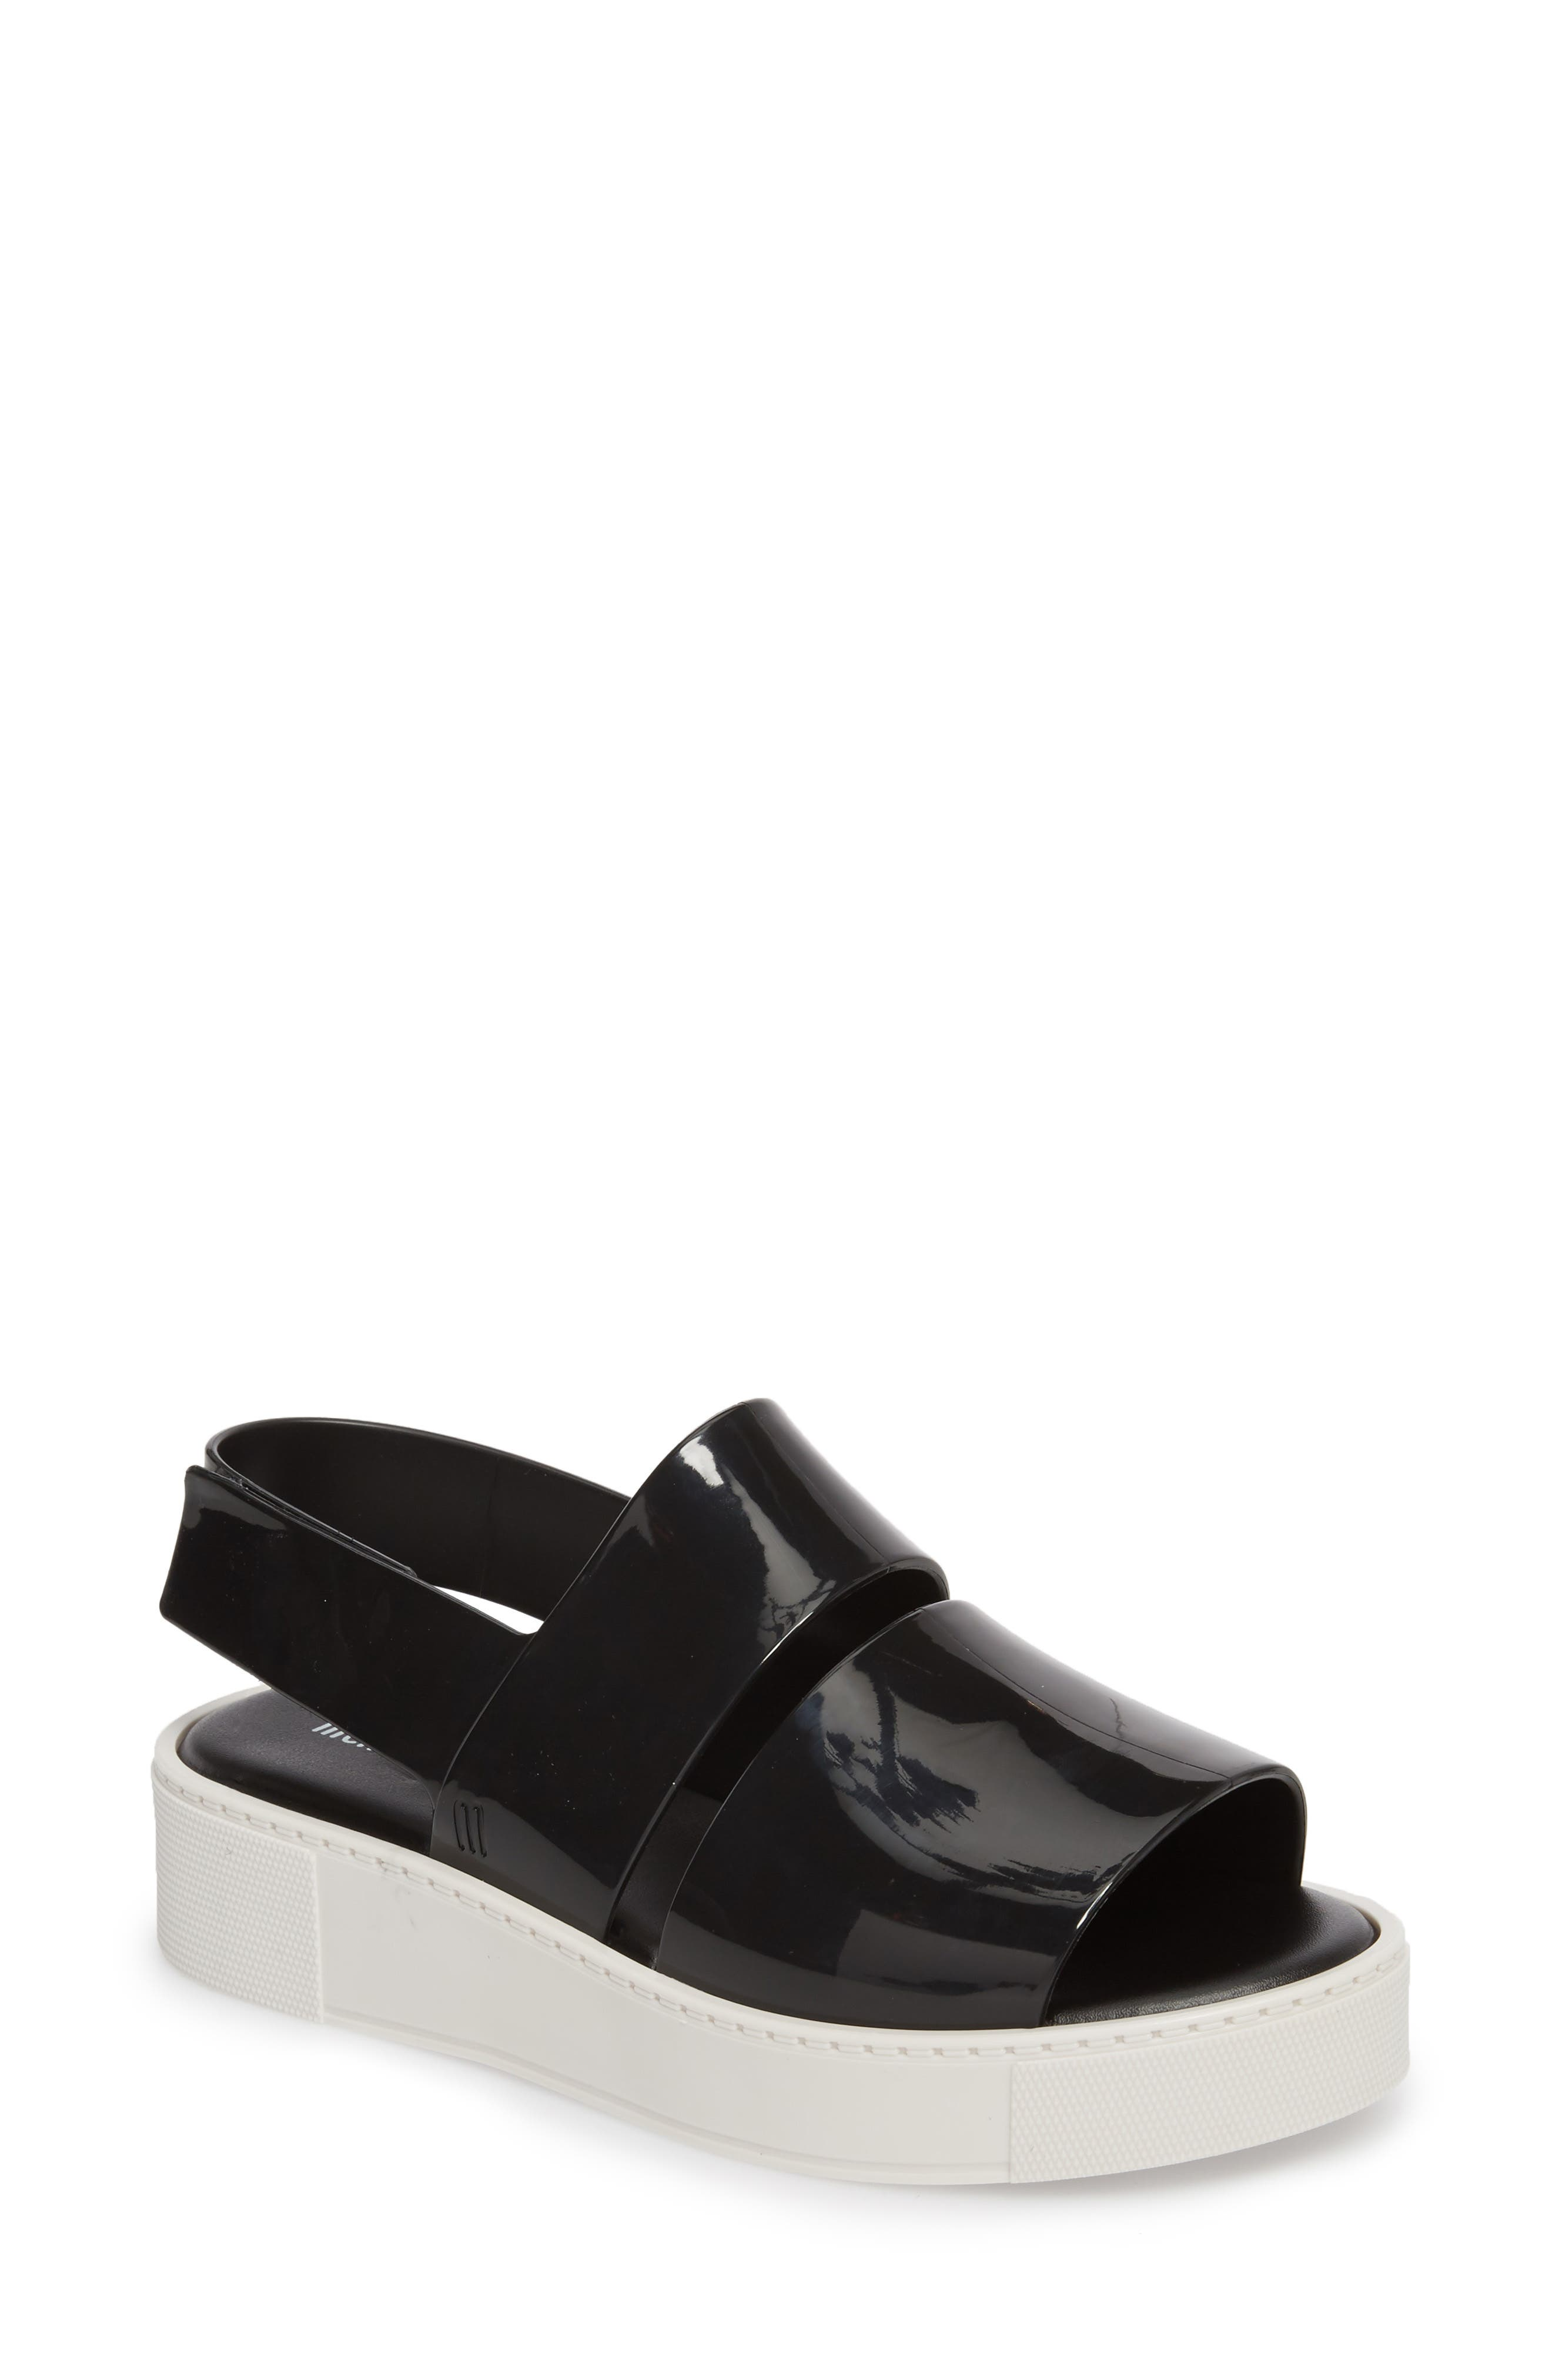 Alternate Image 1 Selected - Melissa Soho Platform Sandal (Women)